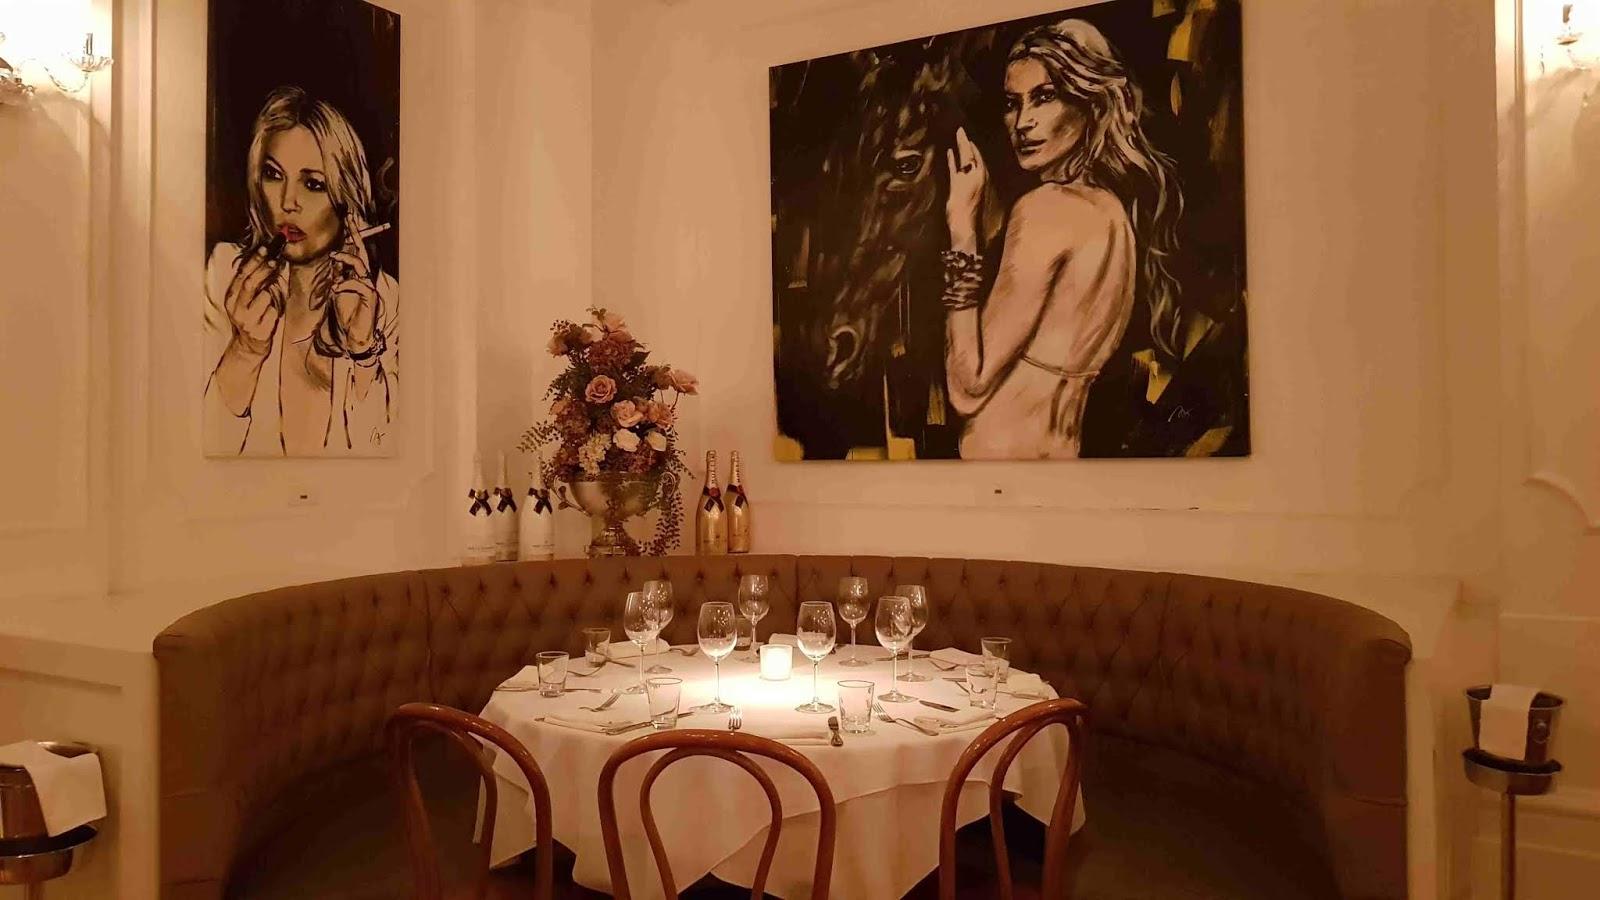 Blog Apaixonados por Viagens - Onde Comer no Rio - Restaurante Bagatelle Rio